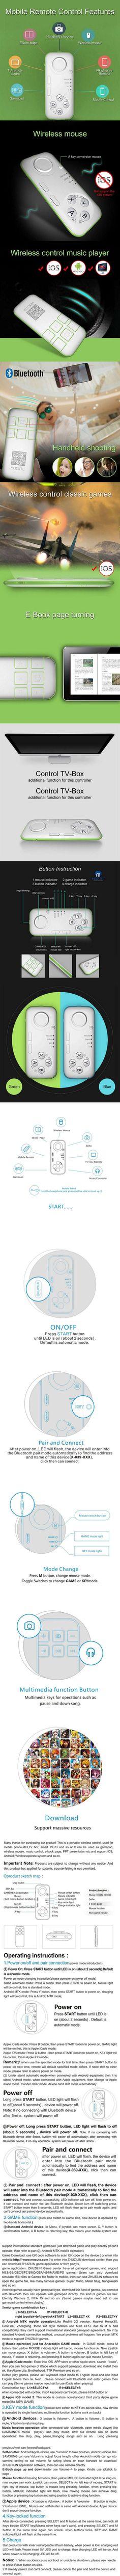 Mocute Brand Mini Bluetooth Joystick Selfie Bluetooth Remote Controller Gamepad Wireless Mouse